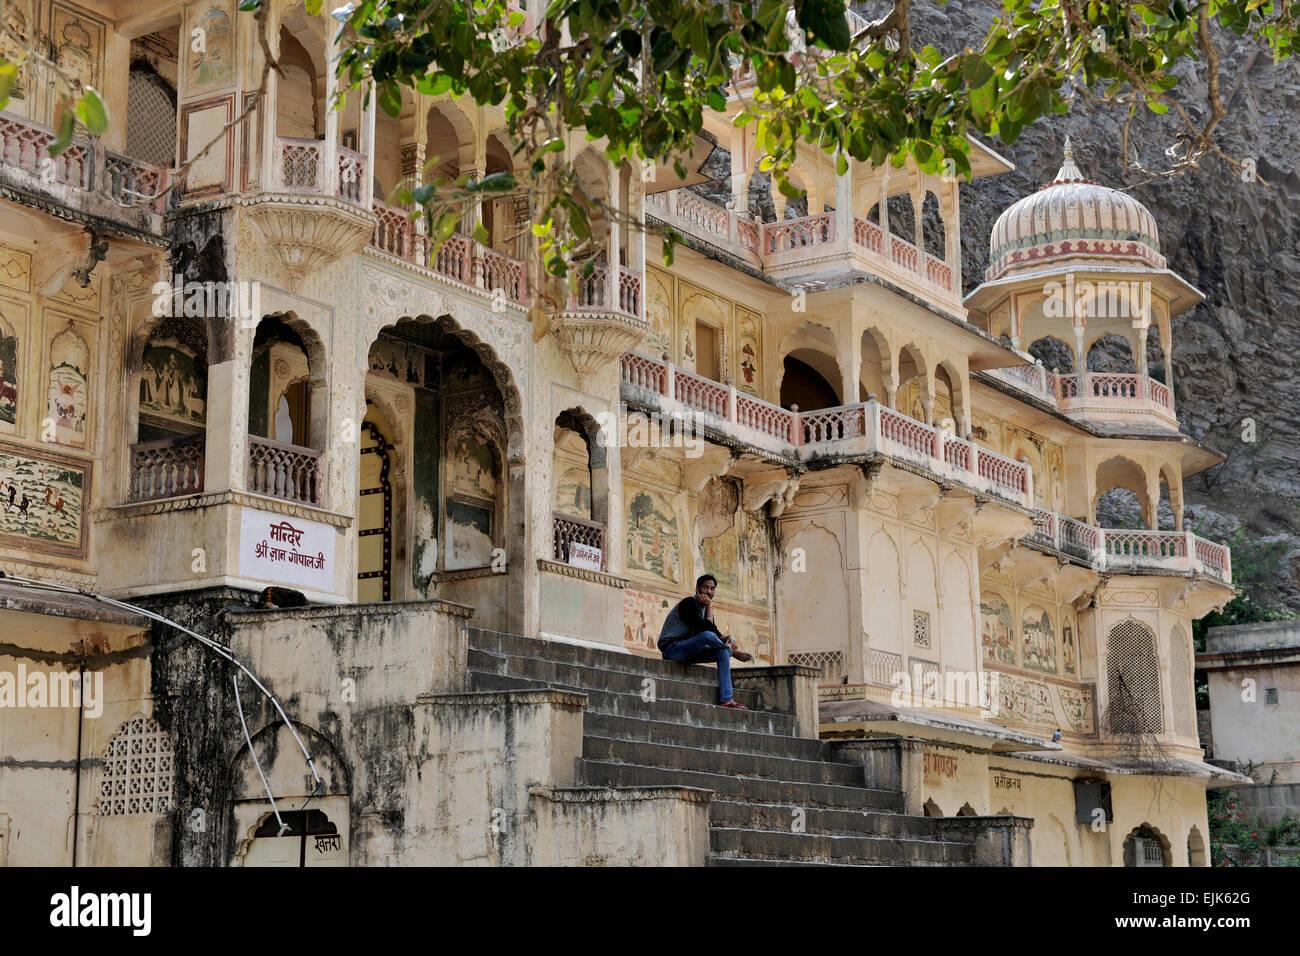 Monkey Temple (Galwar Bagh), Jaipur India Immagini Stock